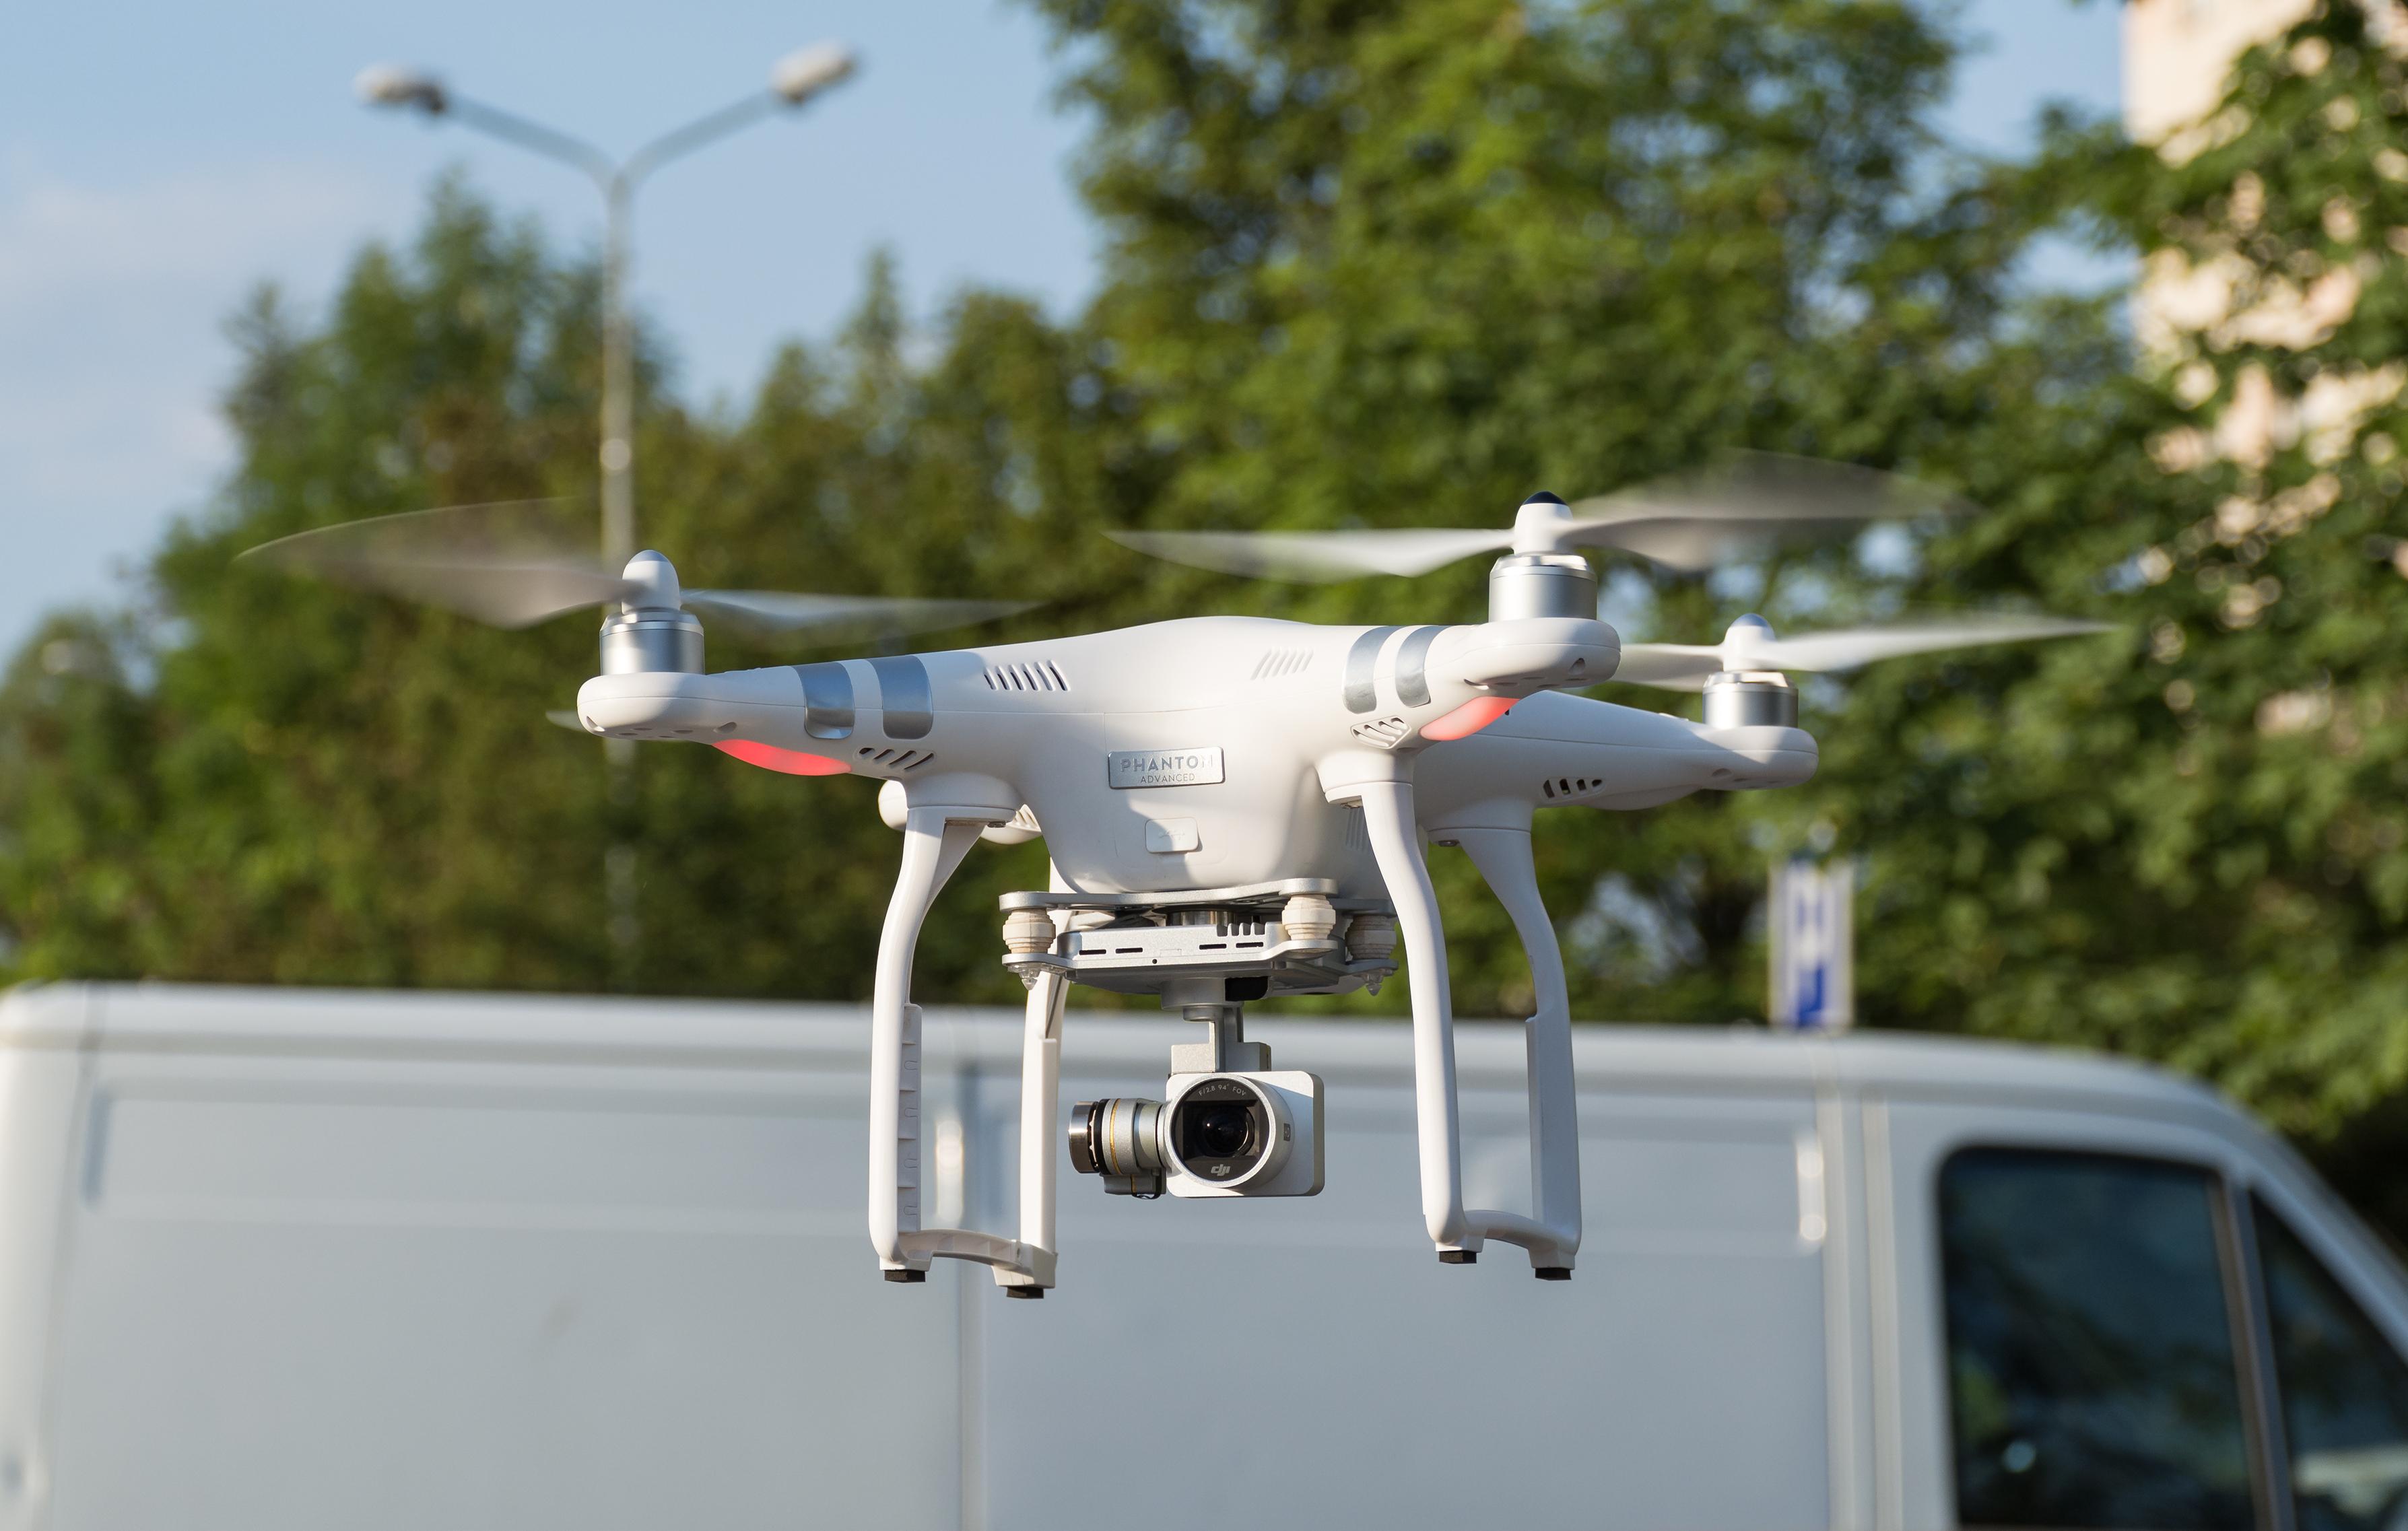 File:2015 Dron DJI Phantom 3 Advanced JPG - Wikimedia Commons